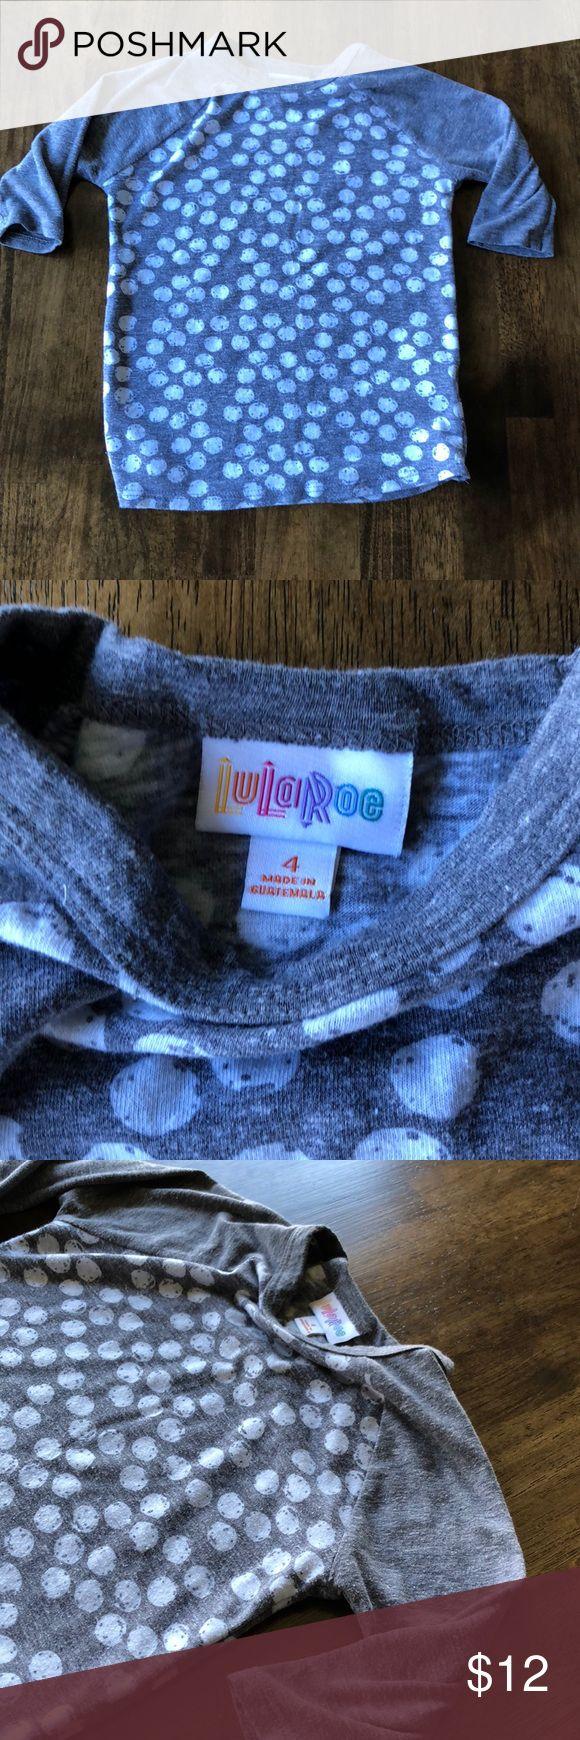 Kids LulaRoe shirt- like new Size 4 and only worn a handful of times! Like new :) LuLaRoe Shirts & Tops Tees - Long Sleeve